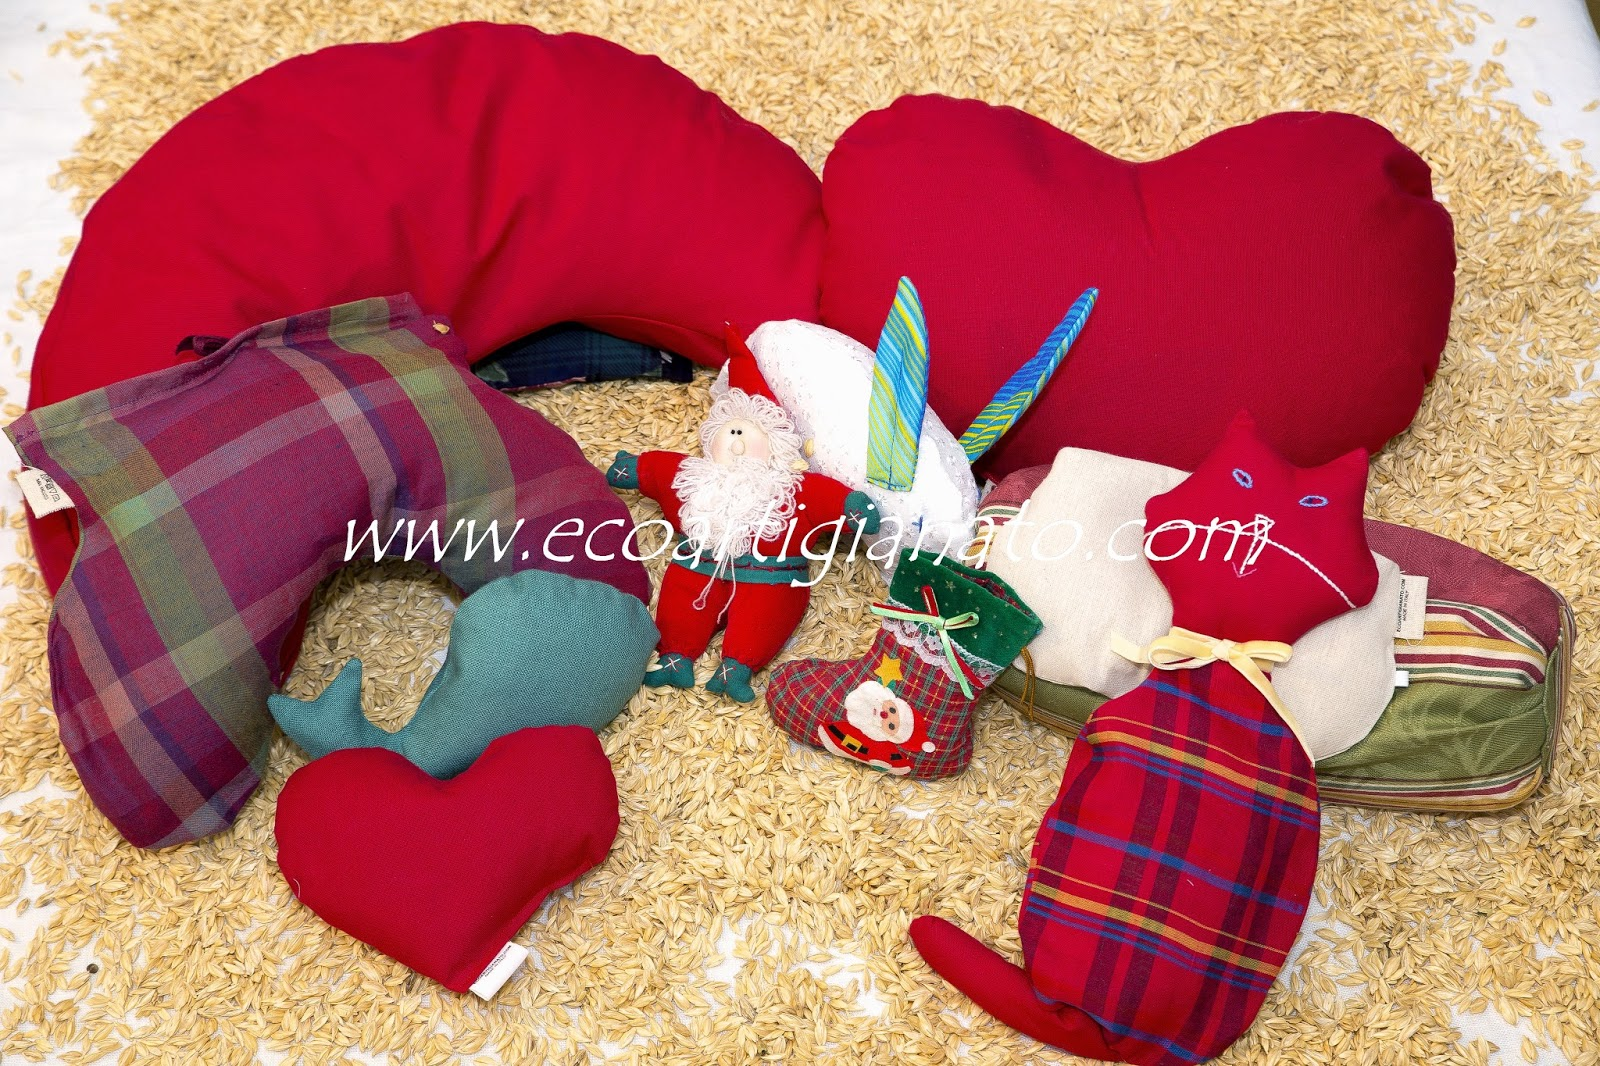 Regali Di Natale Bio.Ecoartigianato Wishlist Regali Di Natale Eco E Bio In Pula Di